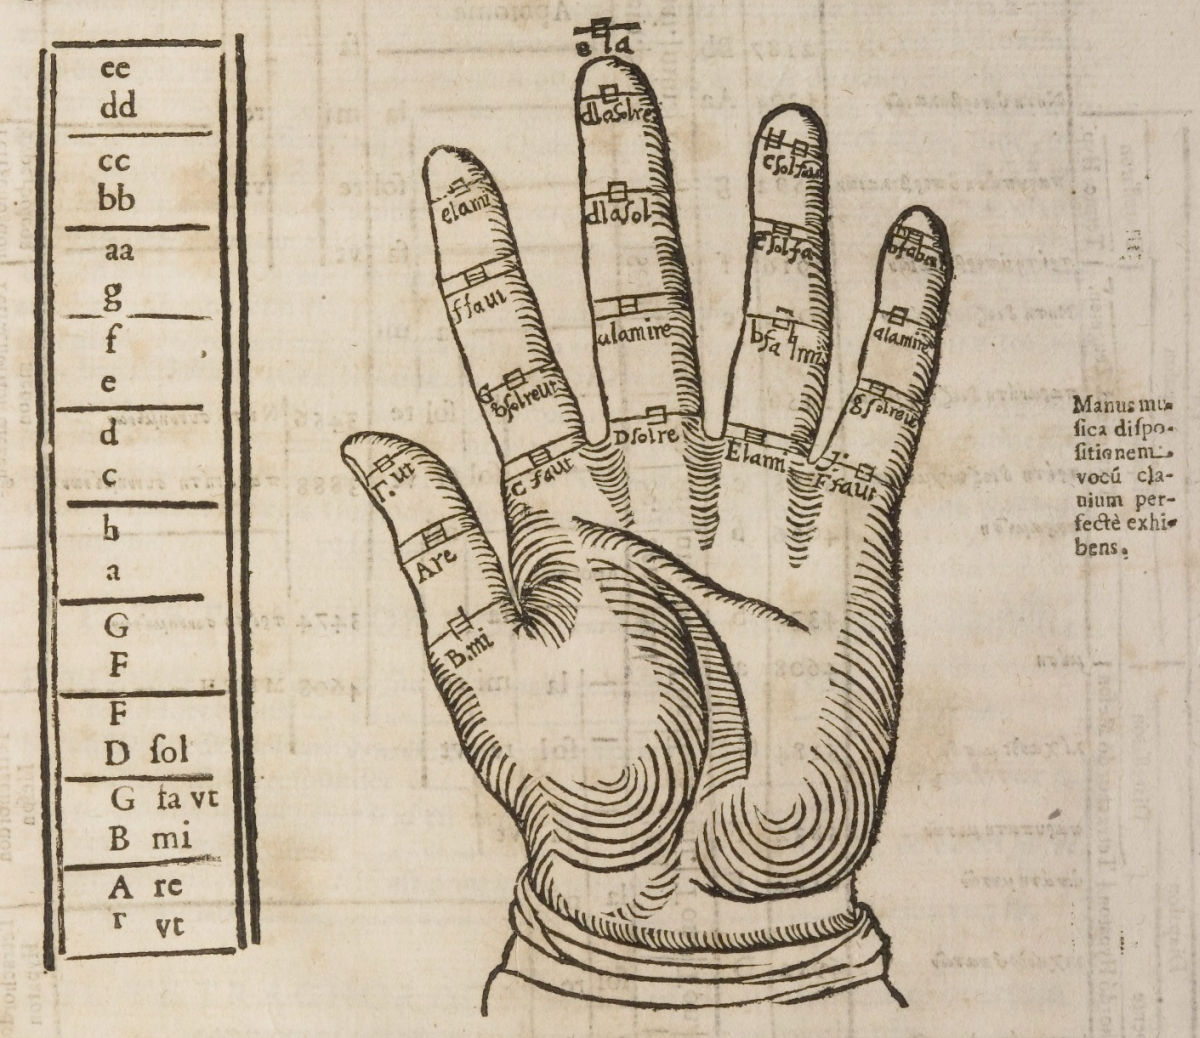 mnemonic device - Guidonian hand